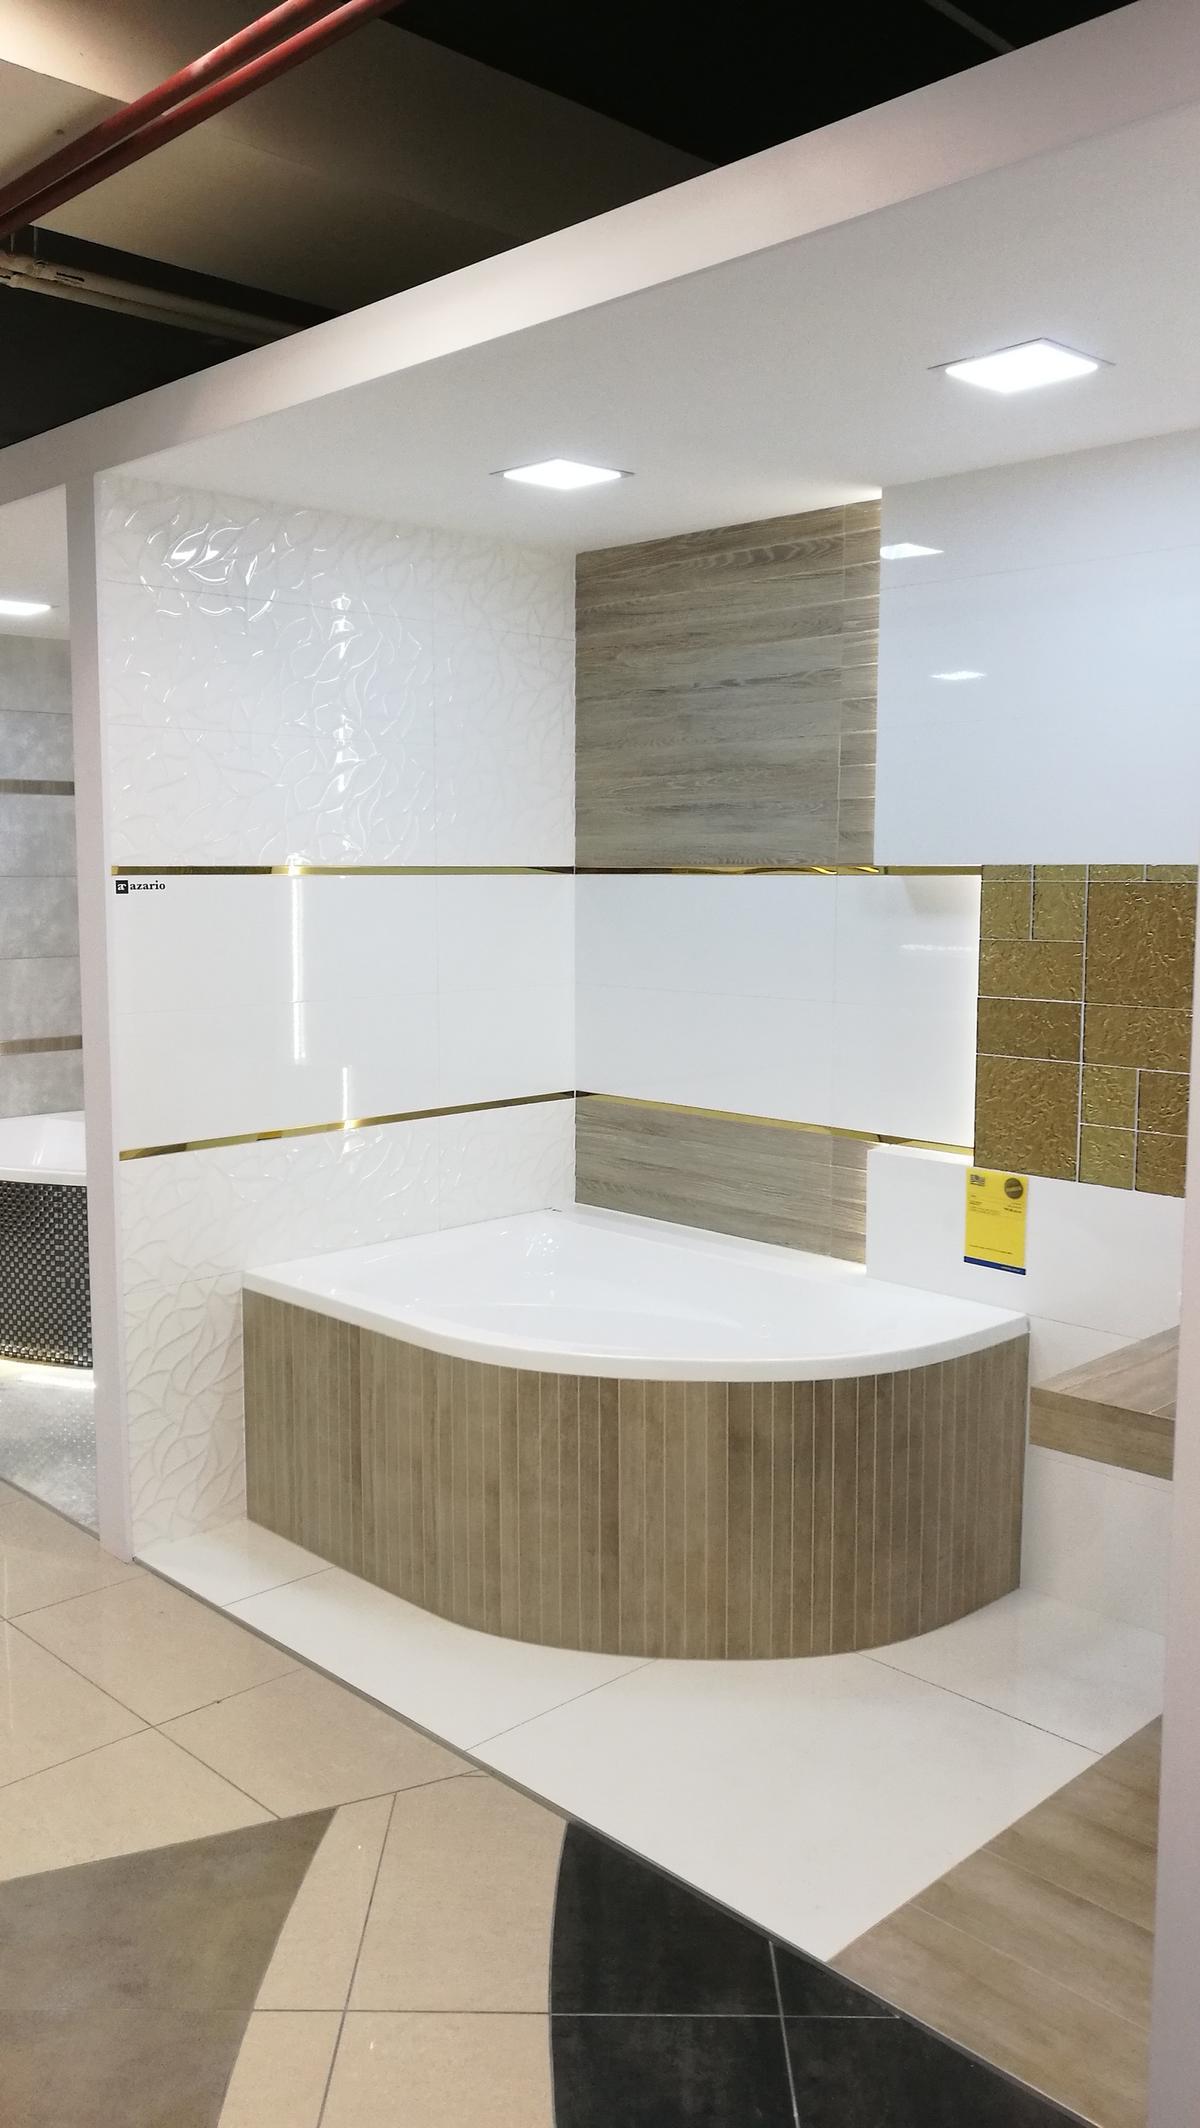 Ekspozycja Azario Zanzibar - BLU salon łazienek Siedlce - zdjęcie od BLU salon łazienek Siedlce